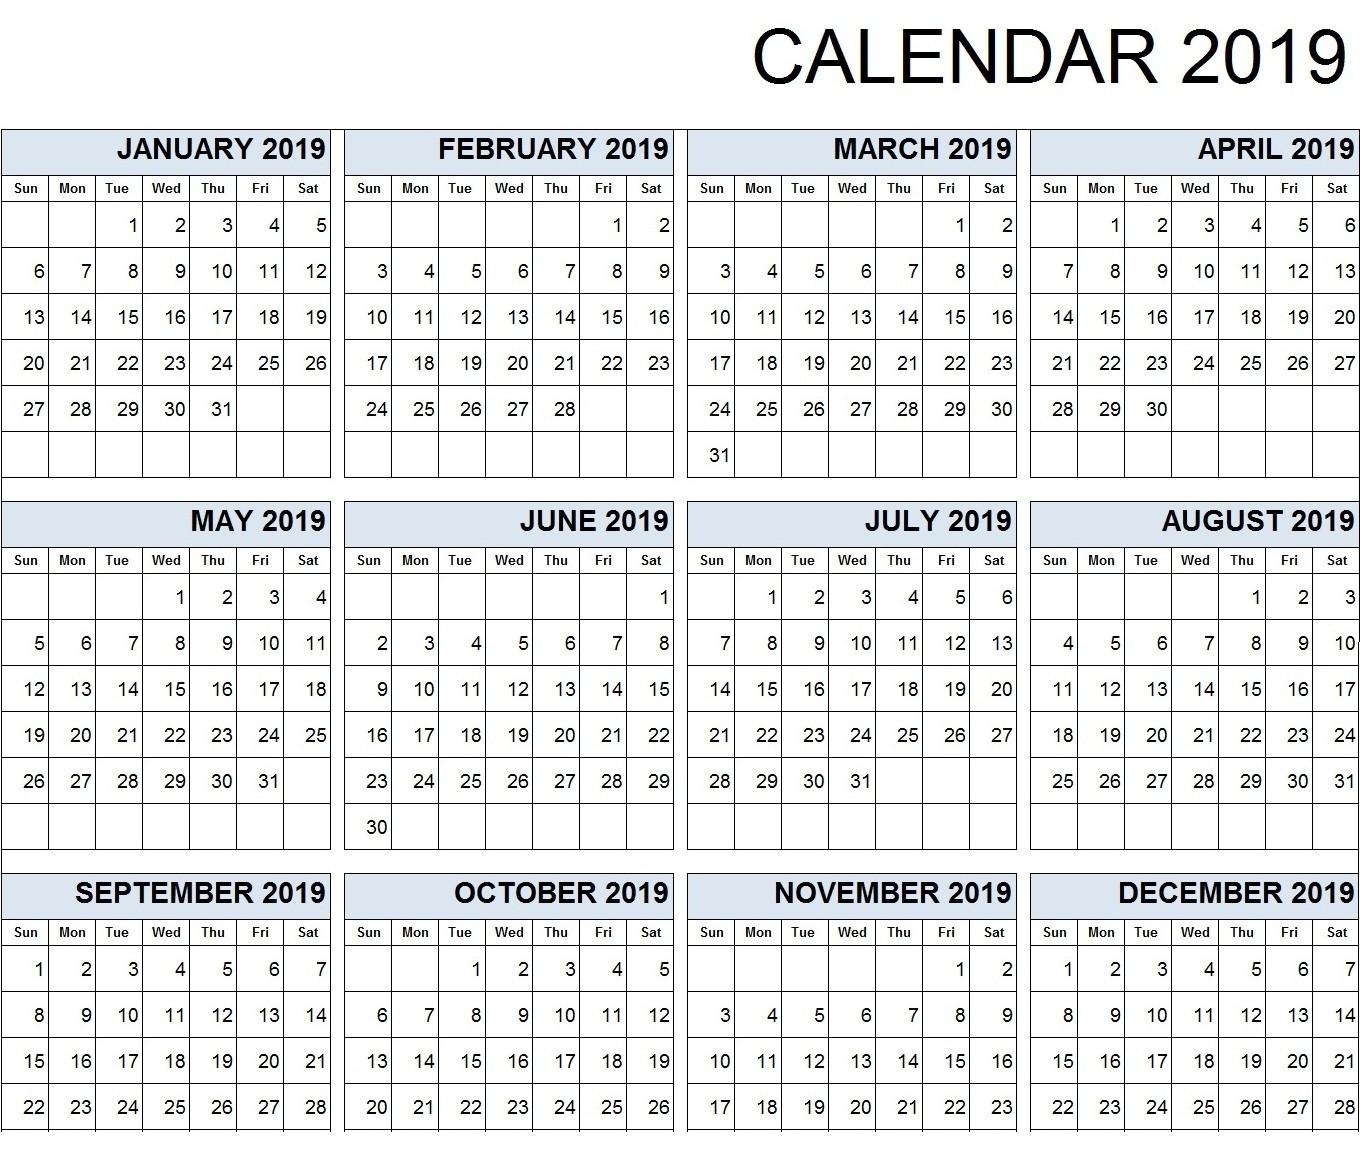 Calendar 2019 Print Out